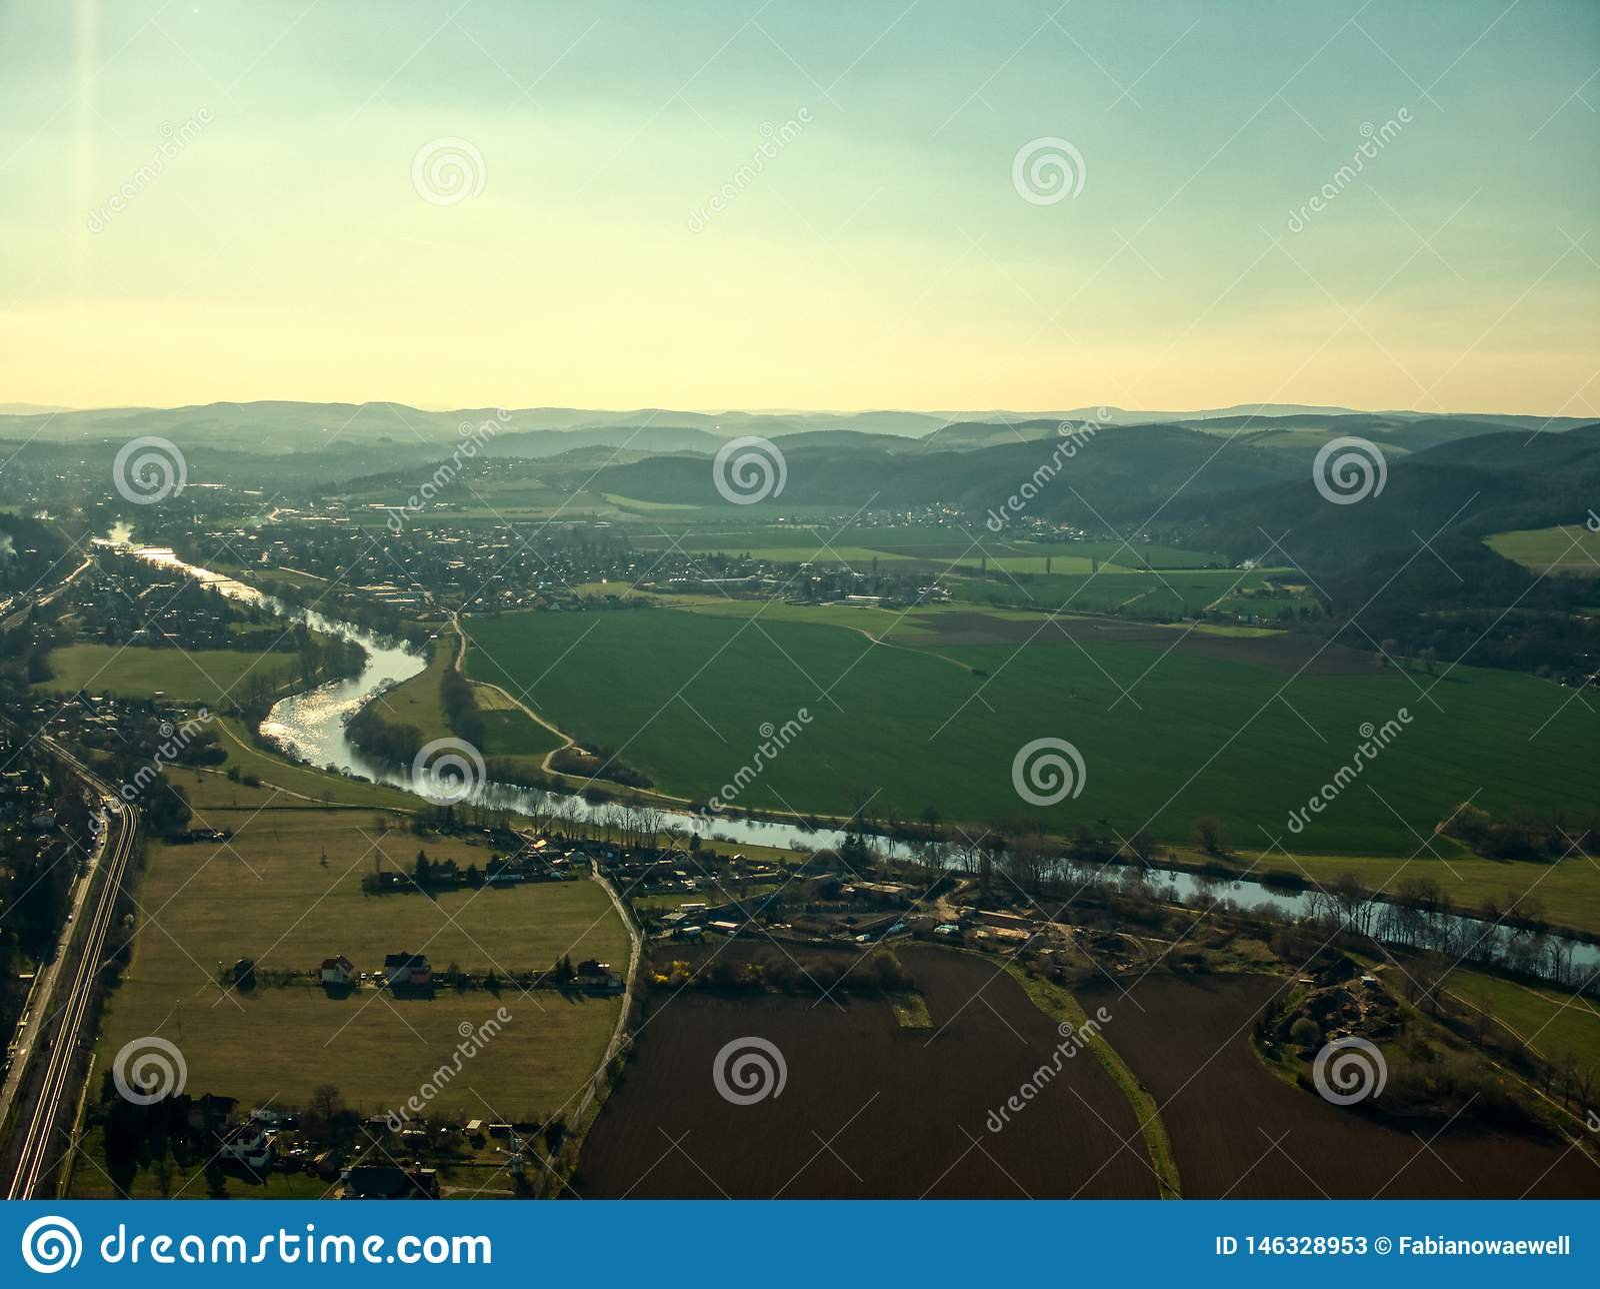 Cernosice寄生虫空中飞行伏尔塔瓦河河农场训练